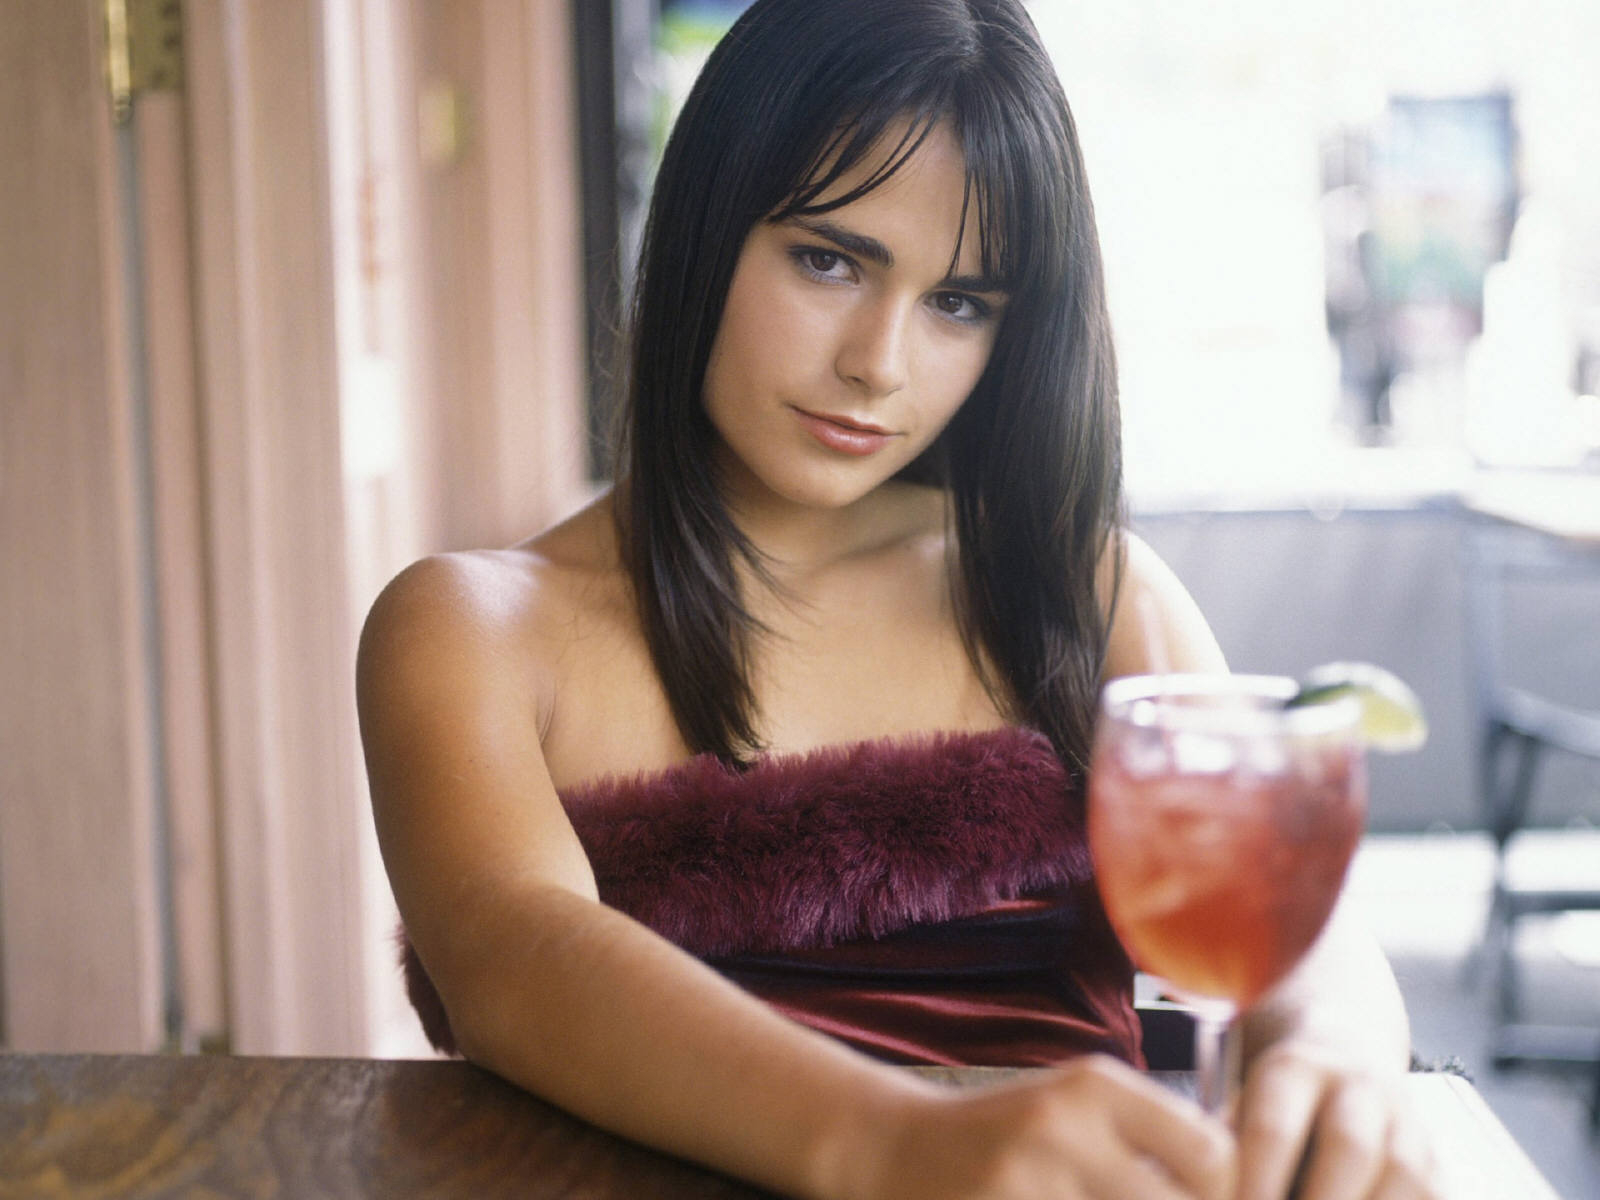 Jordana Brewster sexy picture